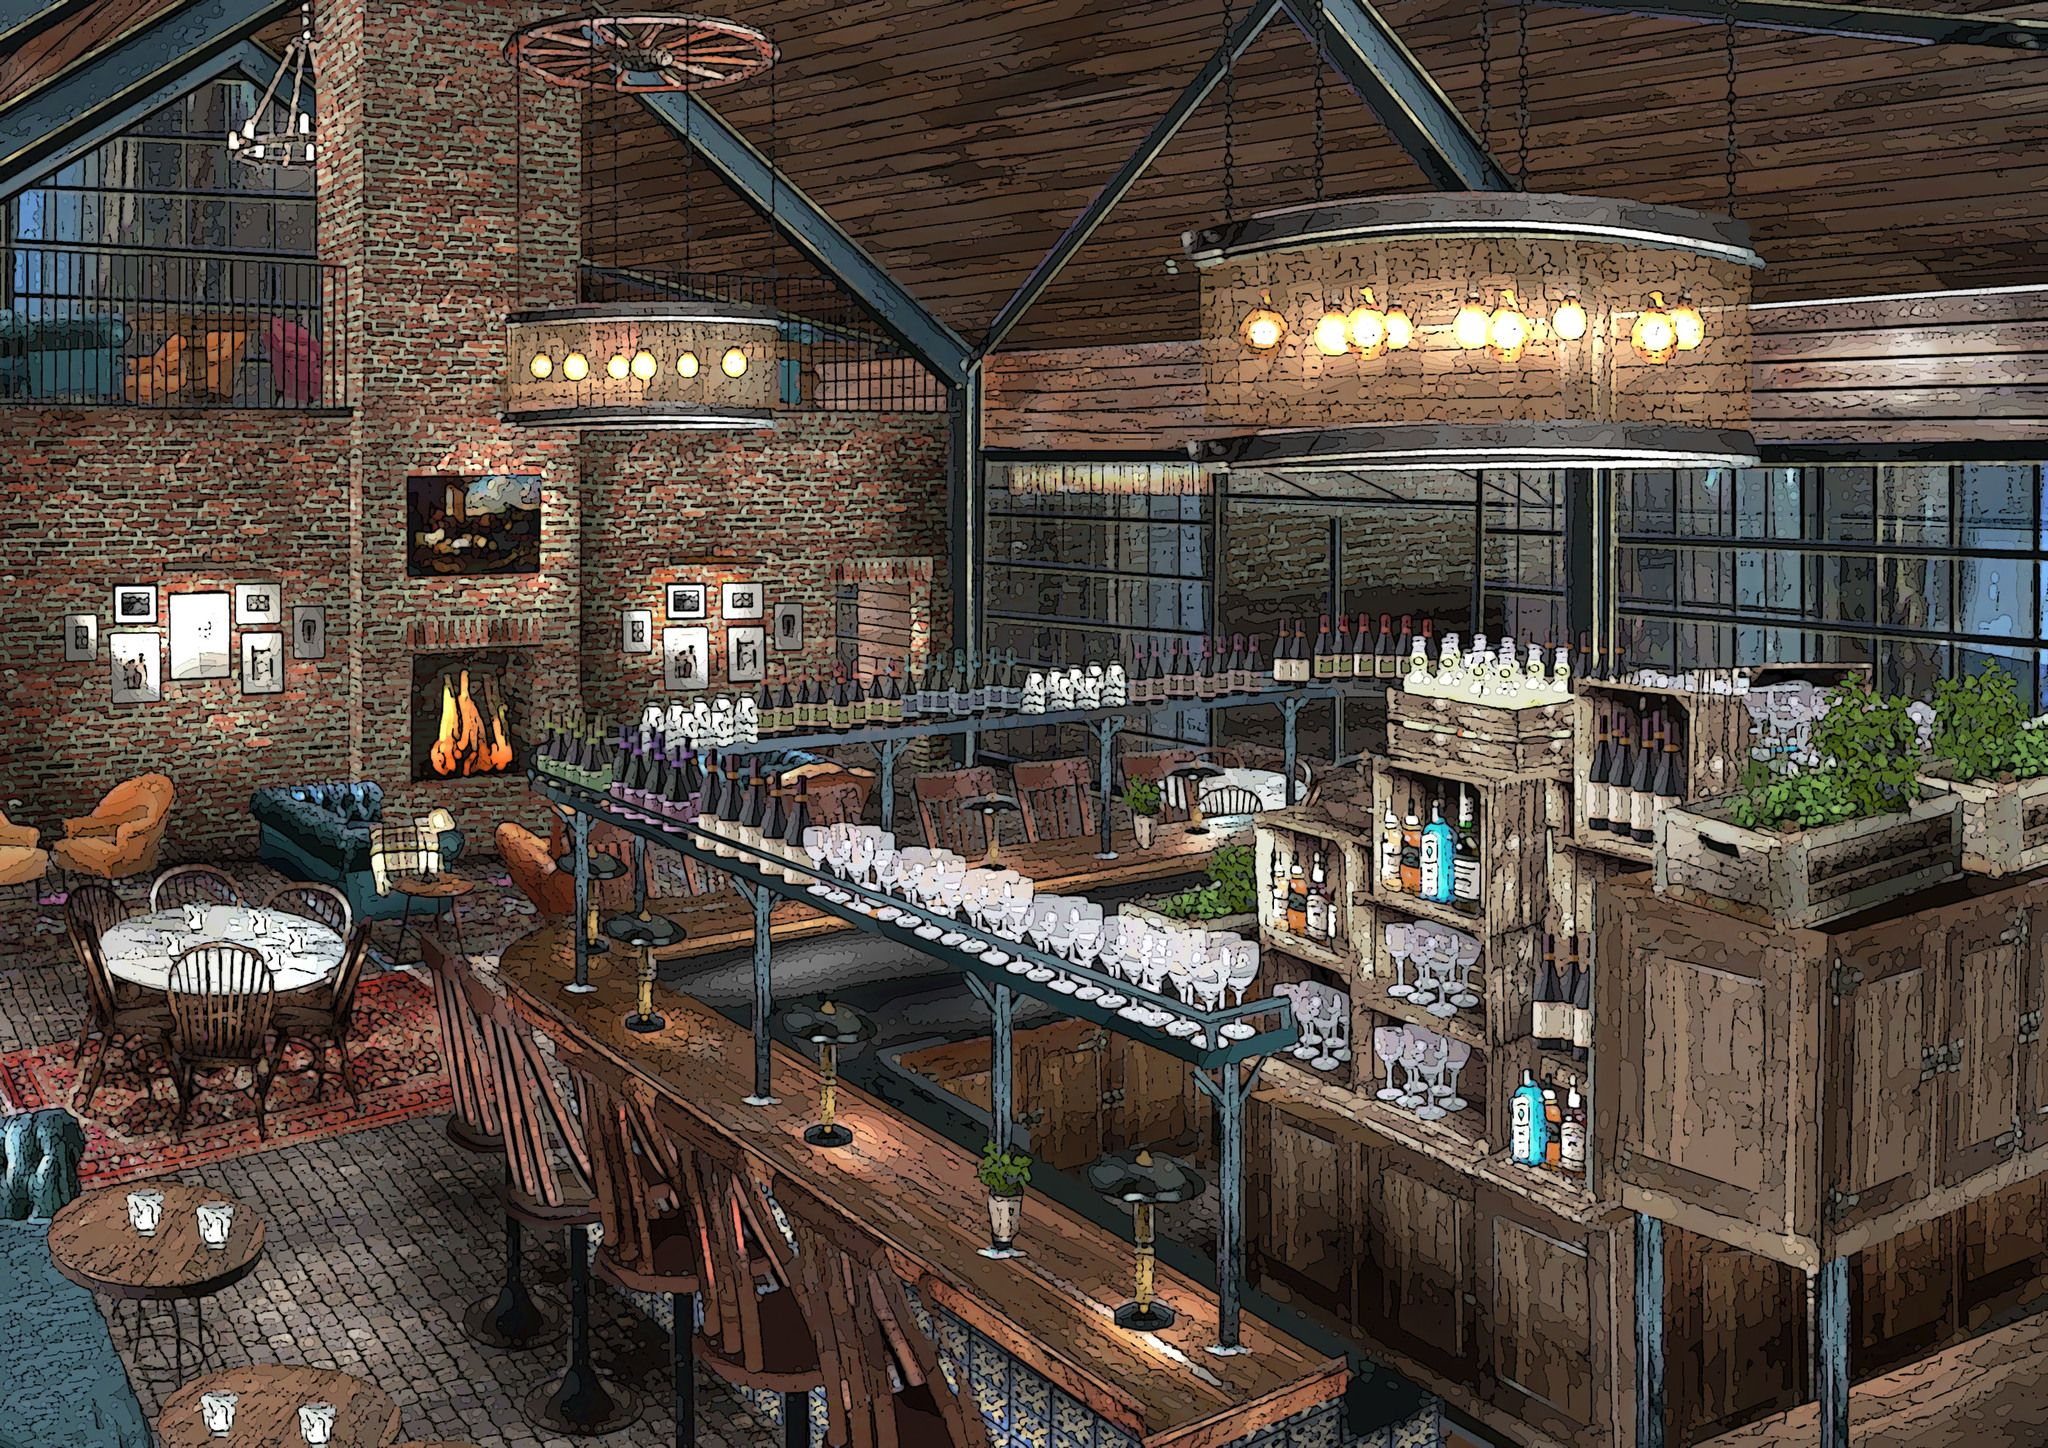 SoHo Farmhouse Bar Or We Could Move To The Country Farmhouse Restaurant Farmhouse Cafe